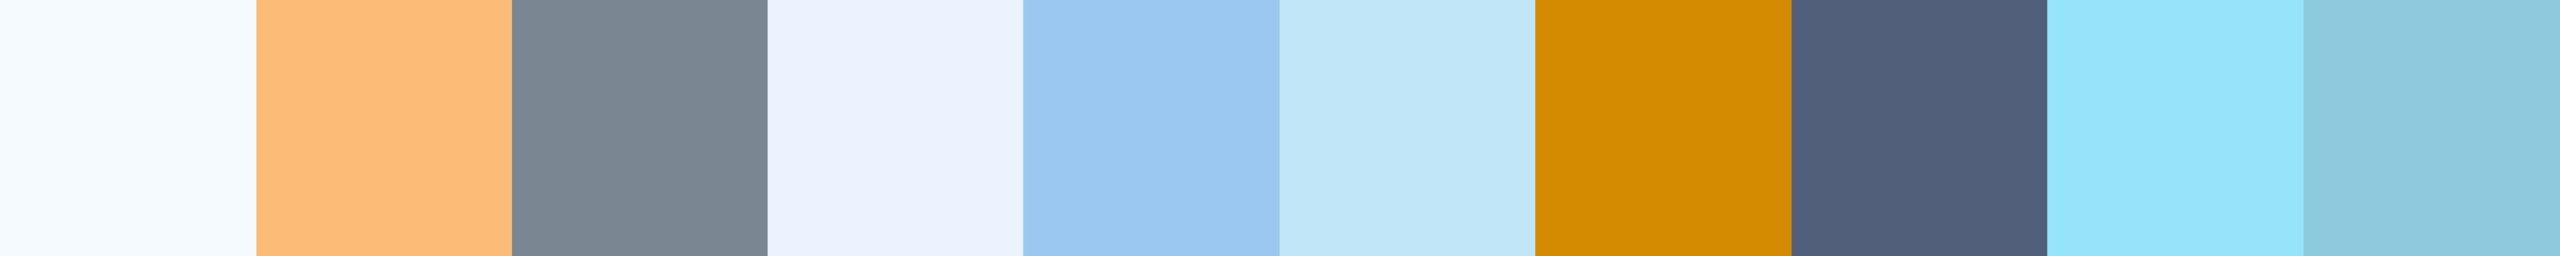 198 Soavala Color Palette